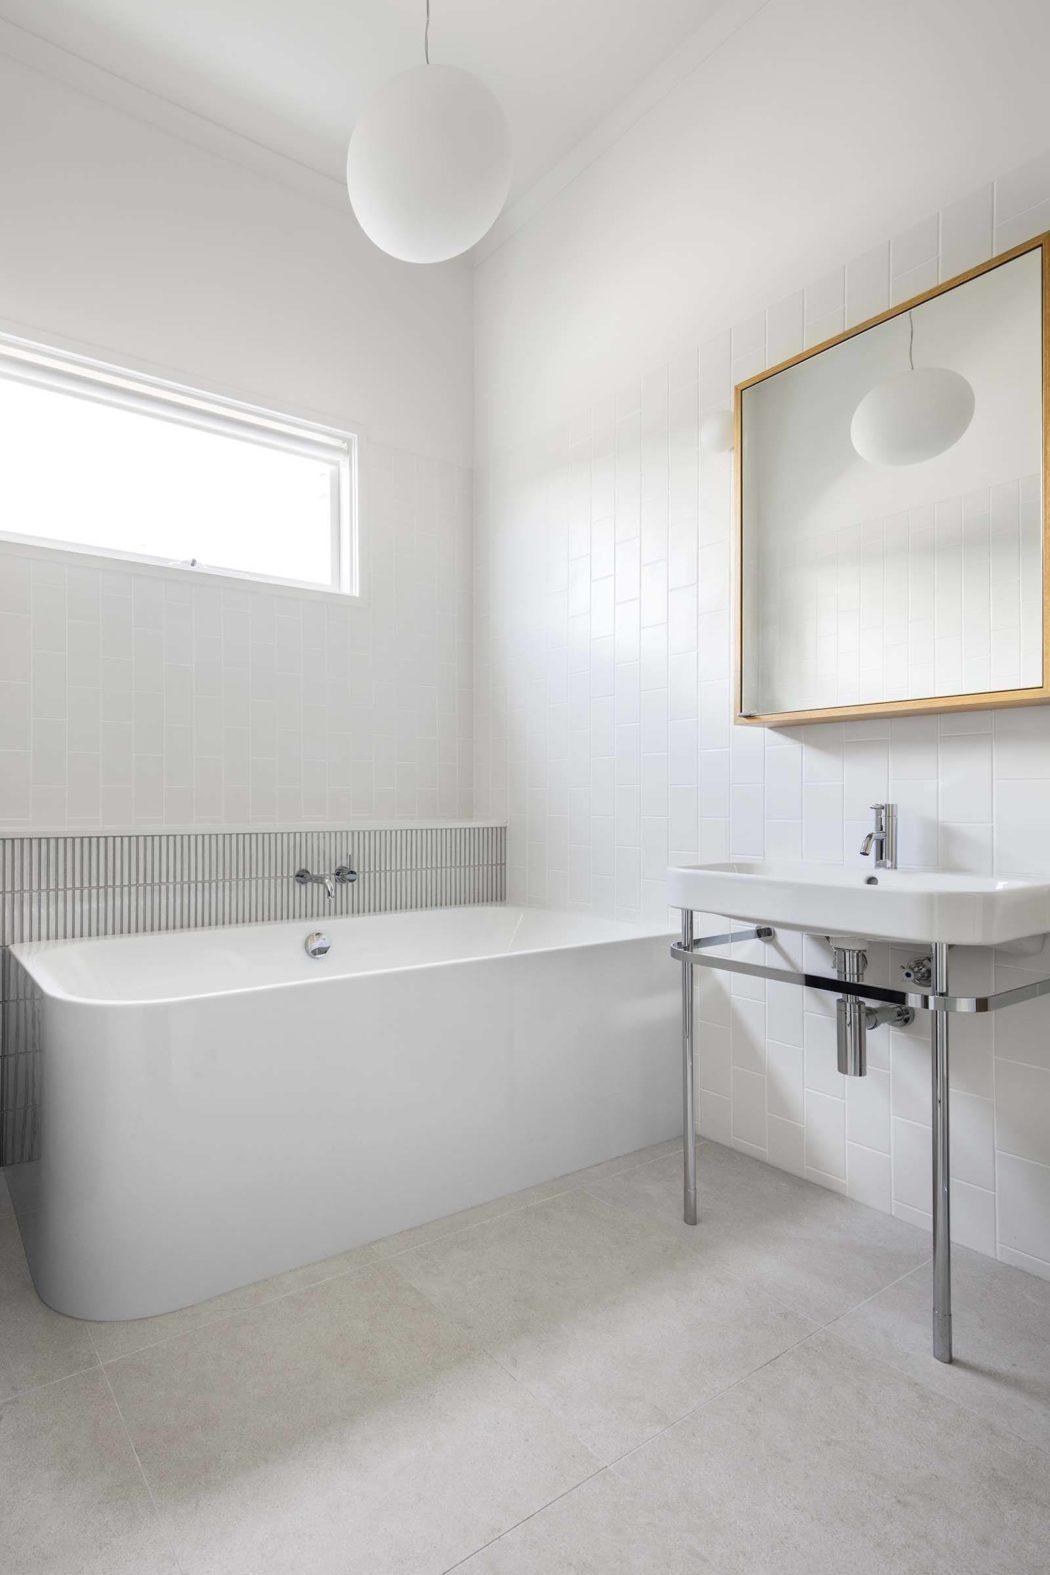 simple bathroom design with a free standing bathtub